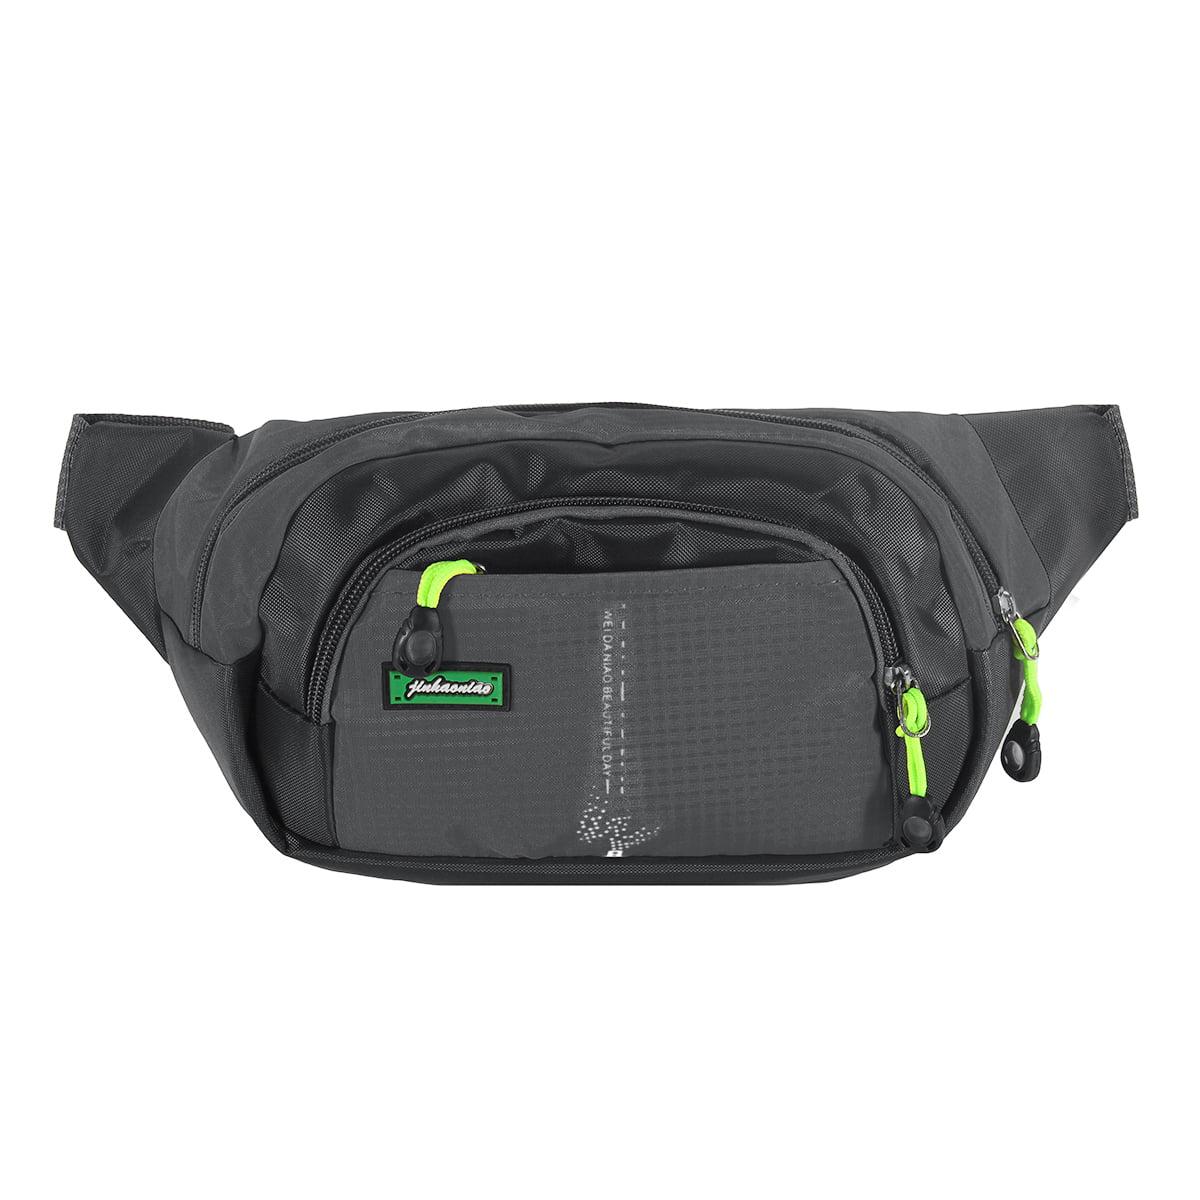 Friends Sport Waist Packs Fanny Pack Adjustable For Run